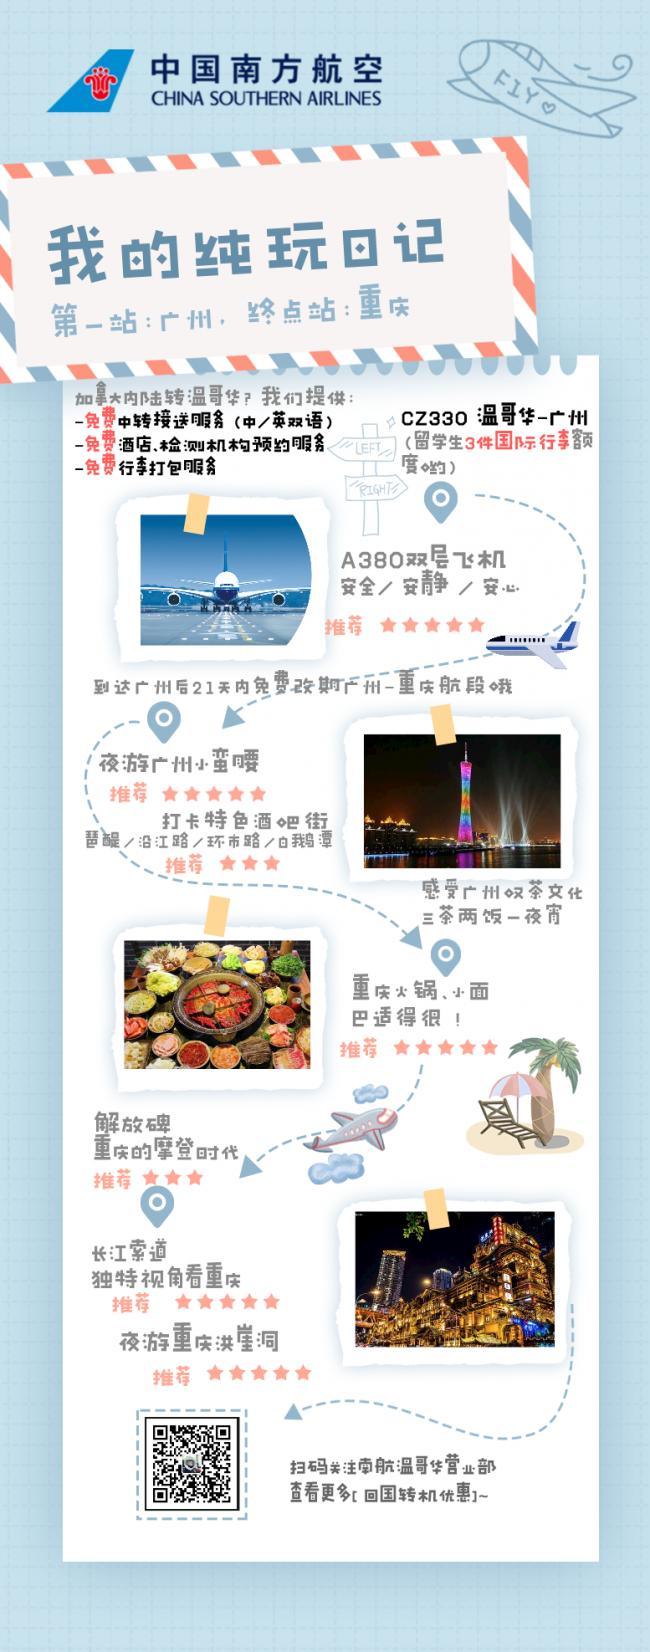 WeChat Image_20210609134717.png